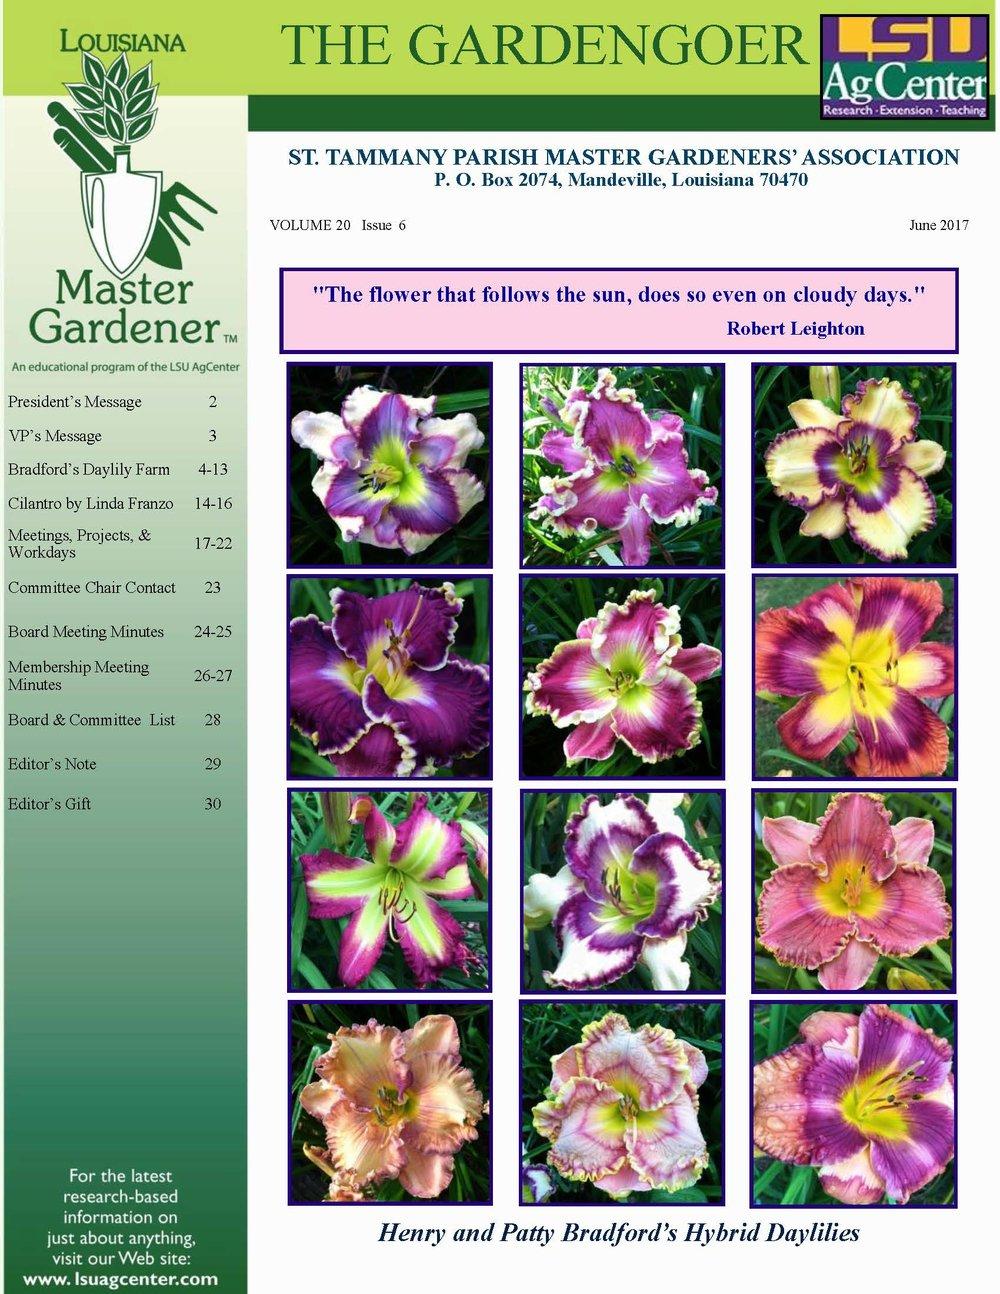 June 2017 Gardengoer_Page_01.jpg